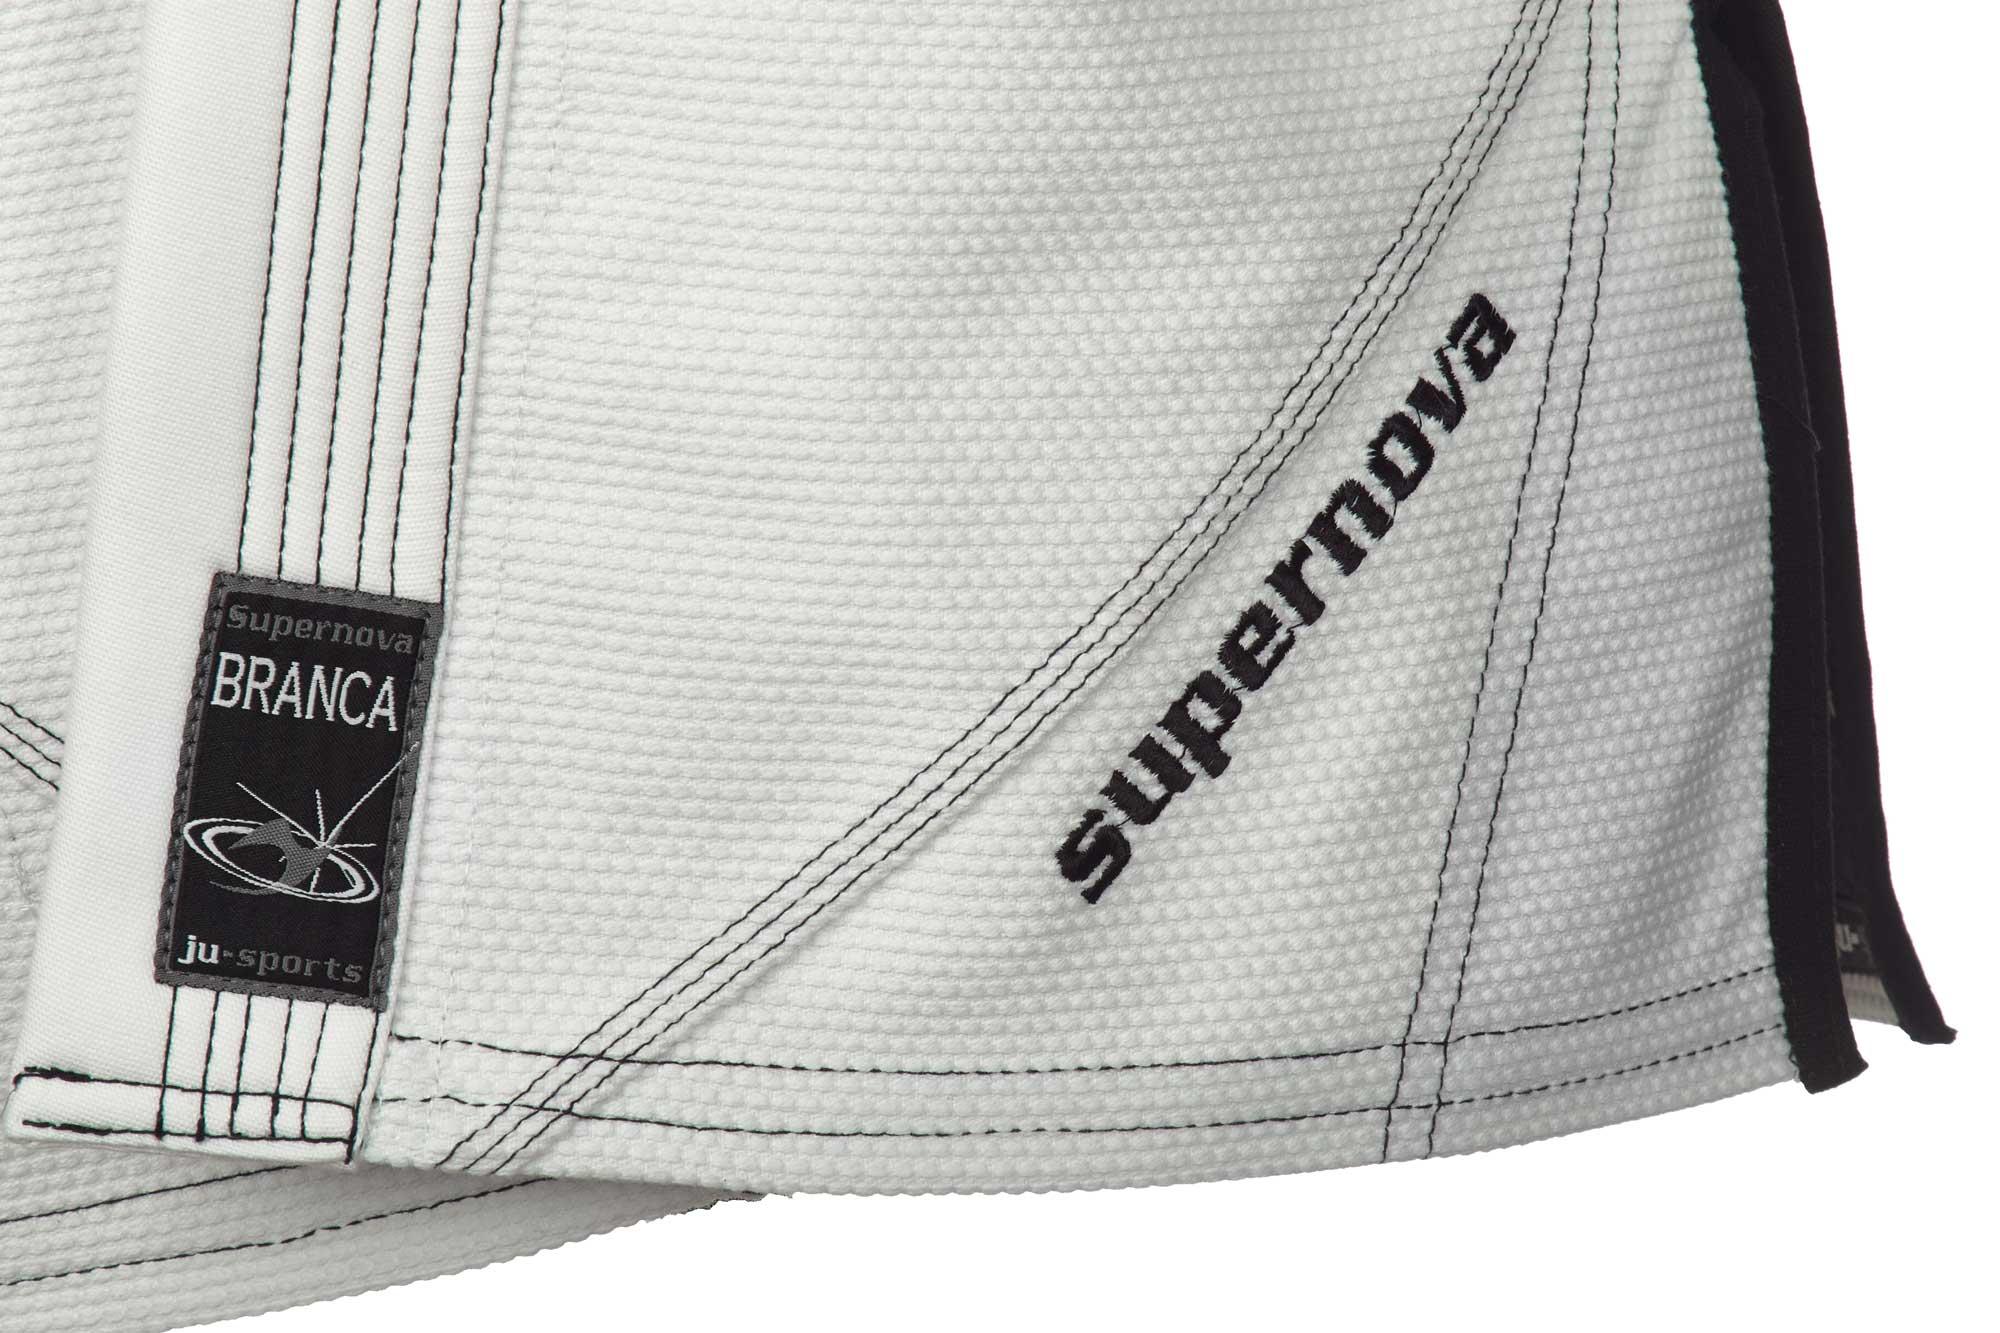 9243000-Supernova-White-Branca-BJJ-Gi-Ju-Jutsu-d3